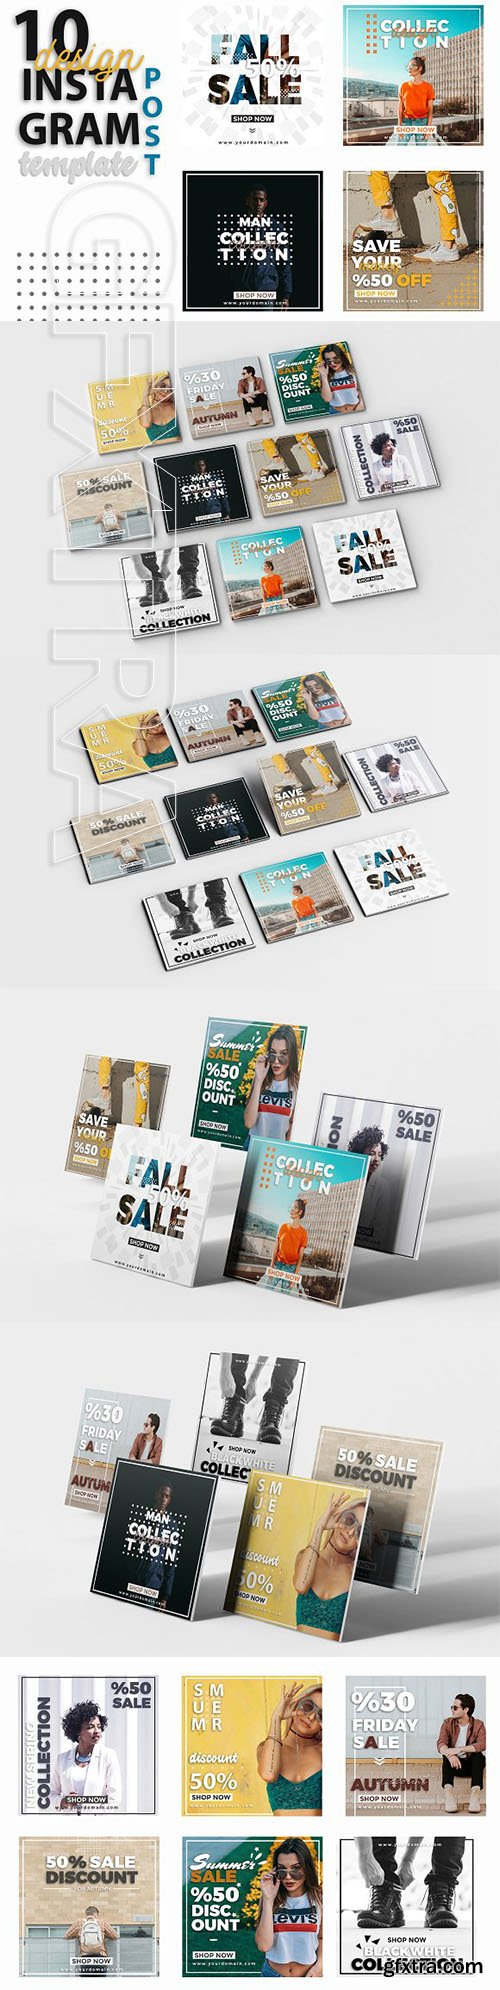 CreativeMarket - Instagram Post Template - Sale 3212471